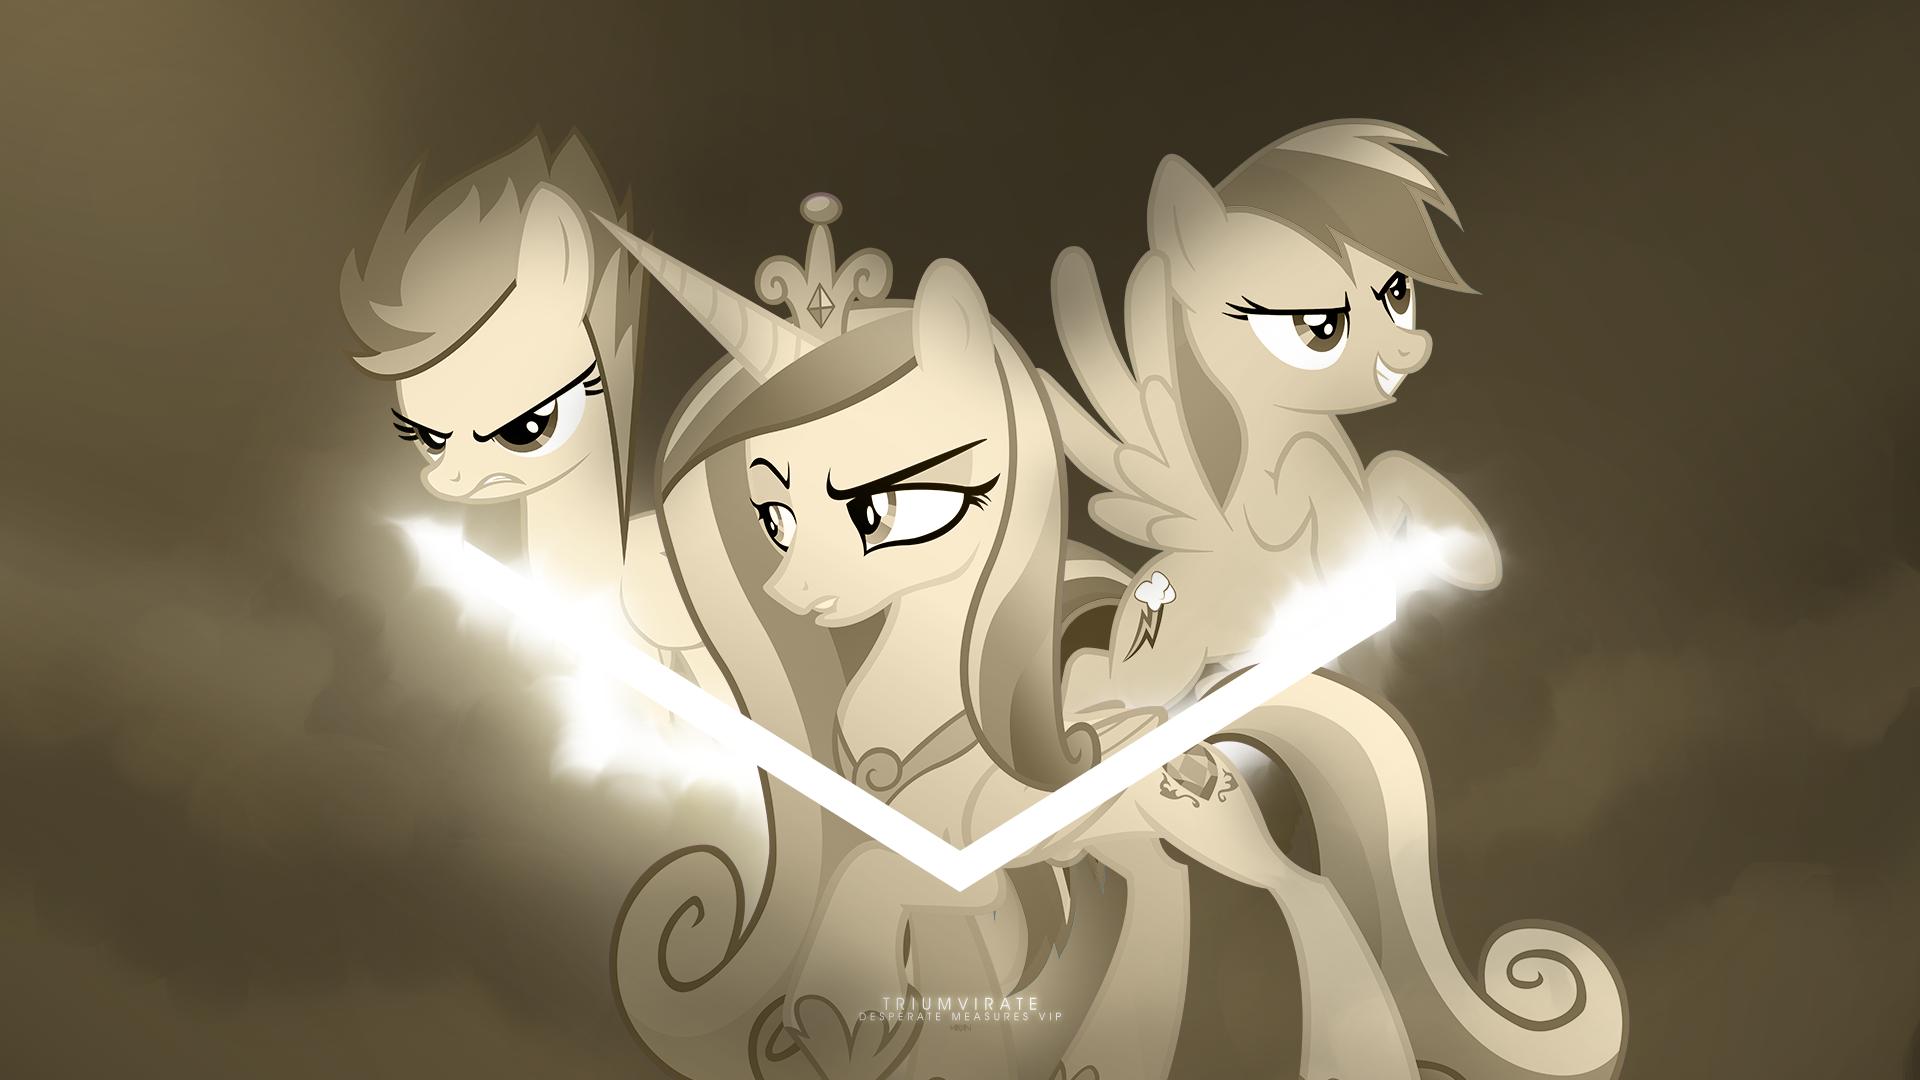 Triumvirate (Desperate Measures VIP) by AlexPony, JennieOo, MikoyaNx and zakbo1337